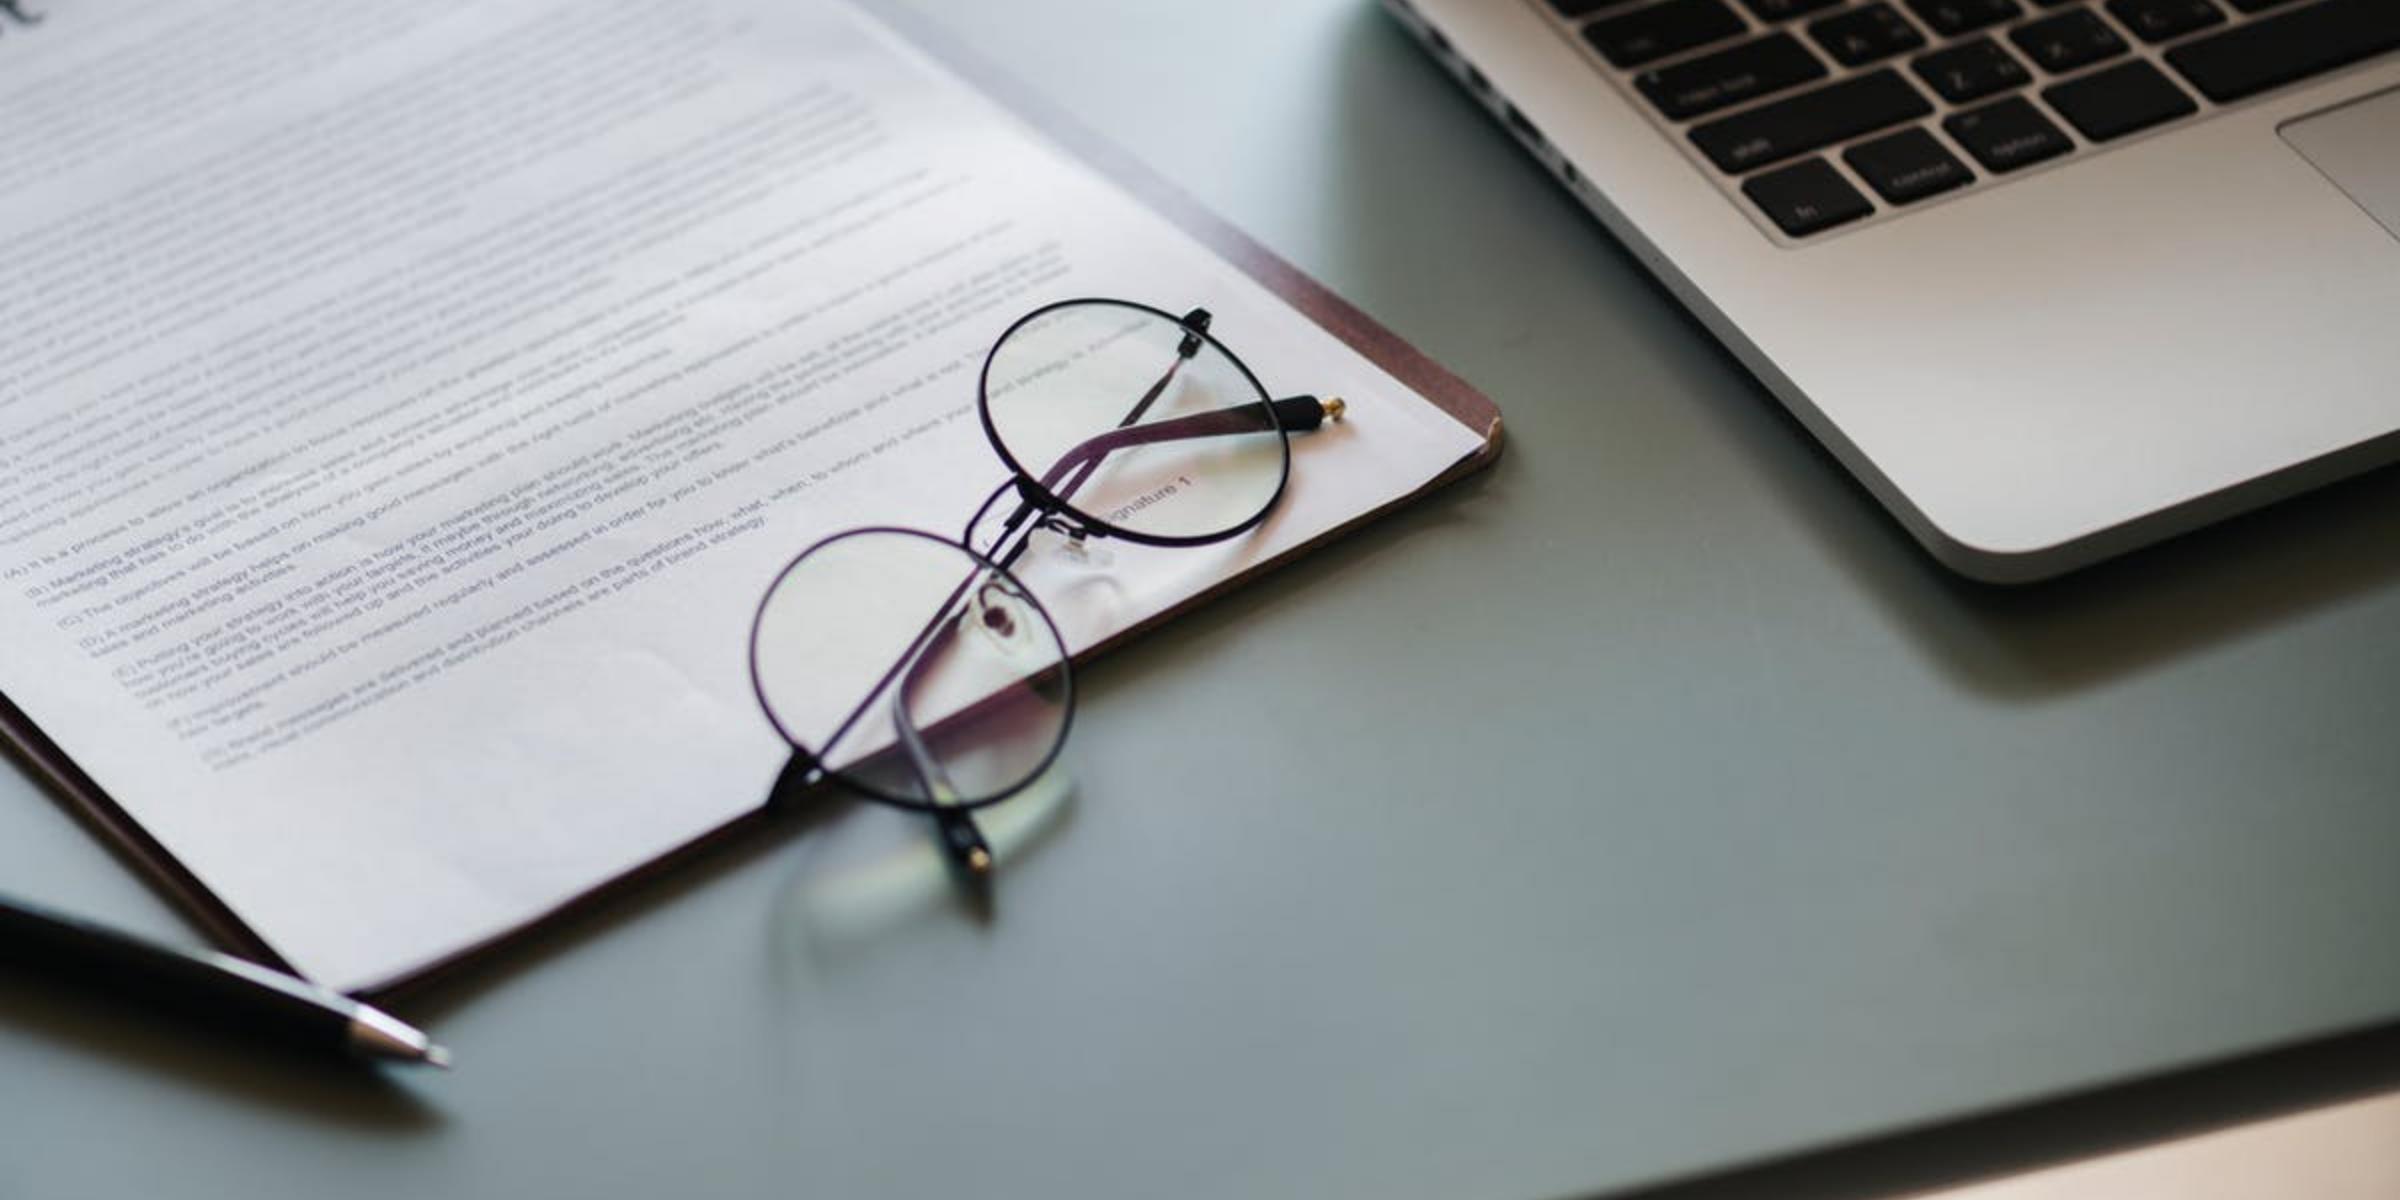 Survey: Many still prefer paper over digital documents